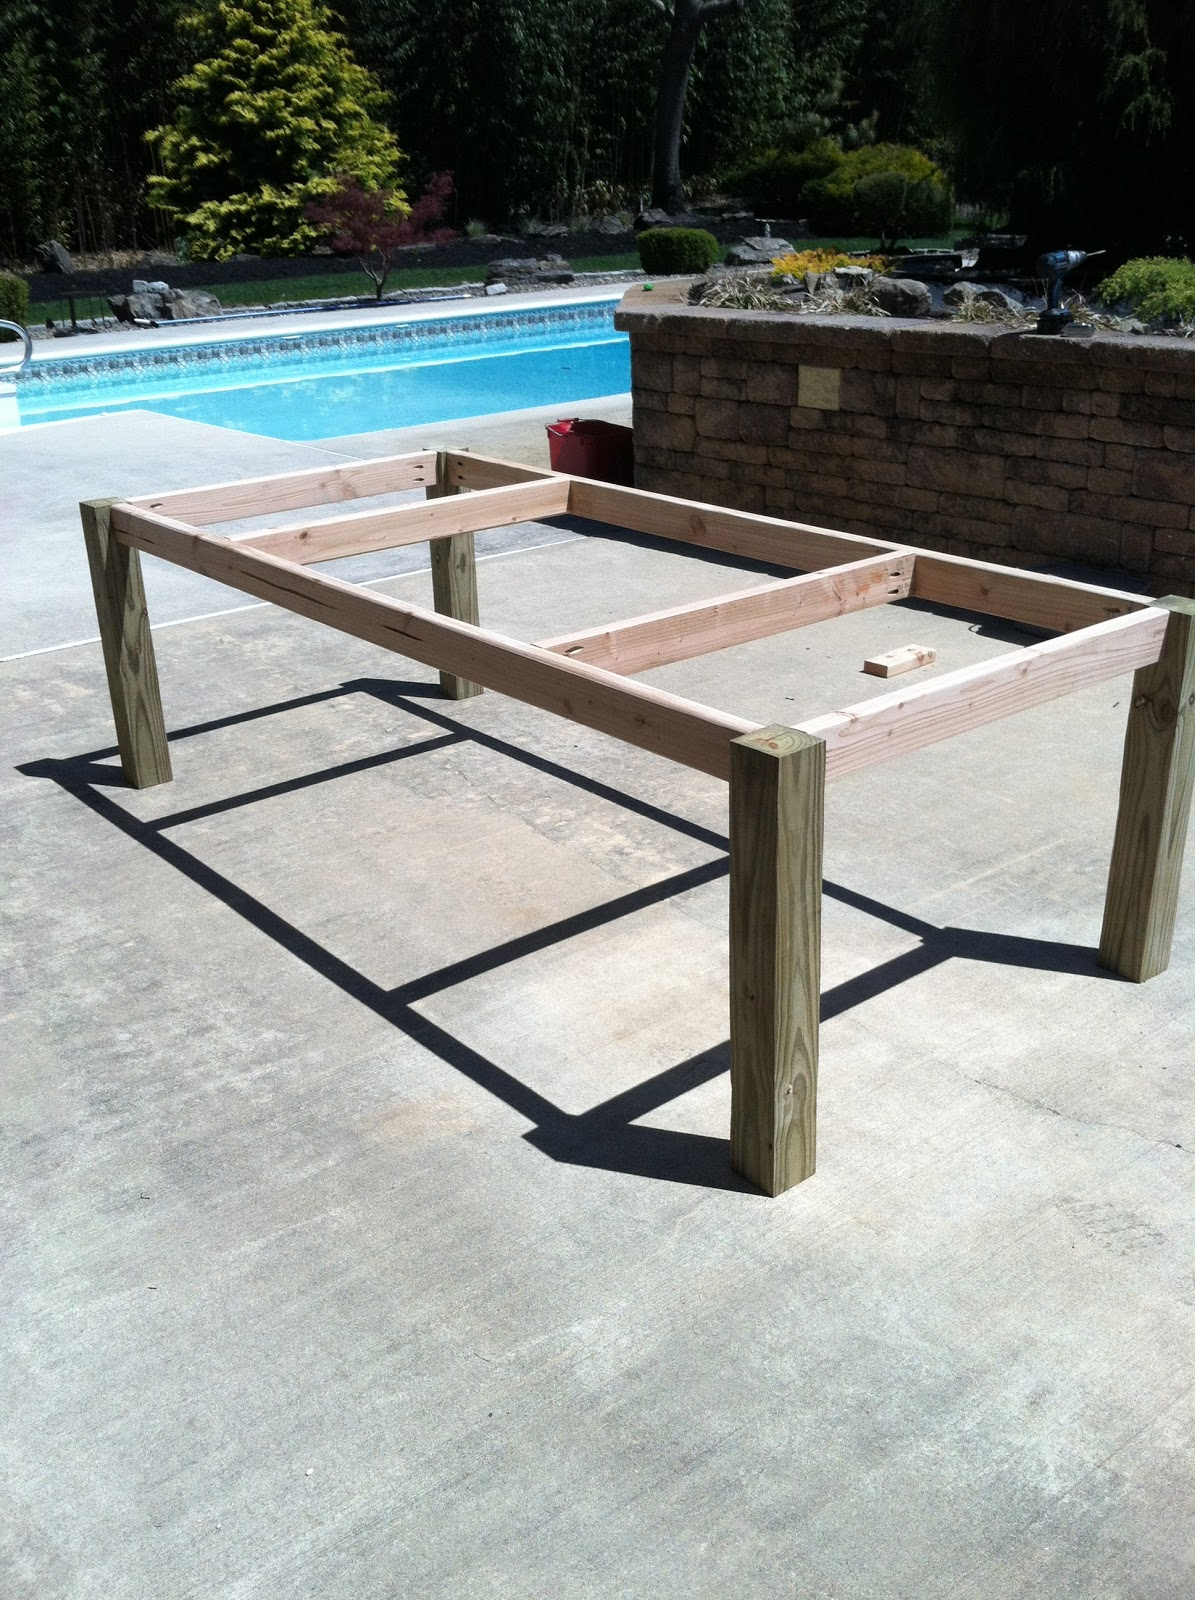 Inspiring Wood Patio Table Diy - Patio Design #395